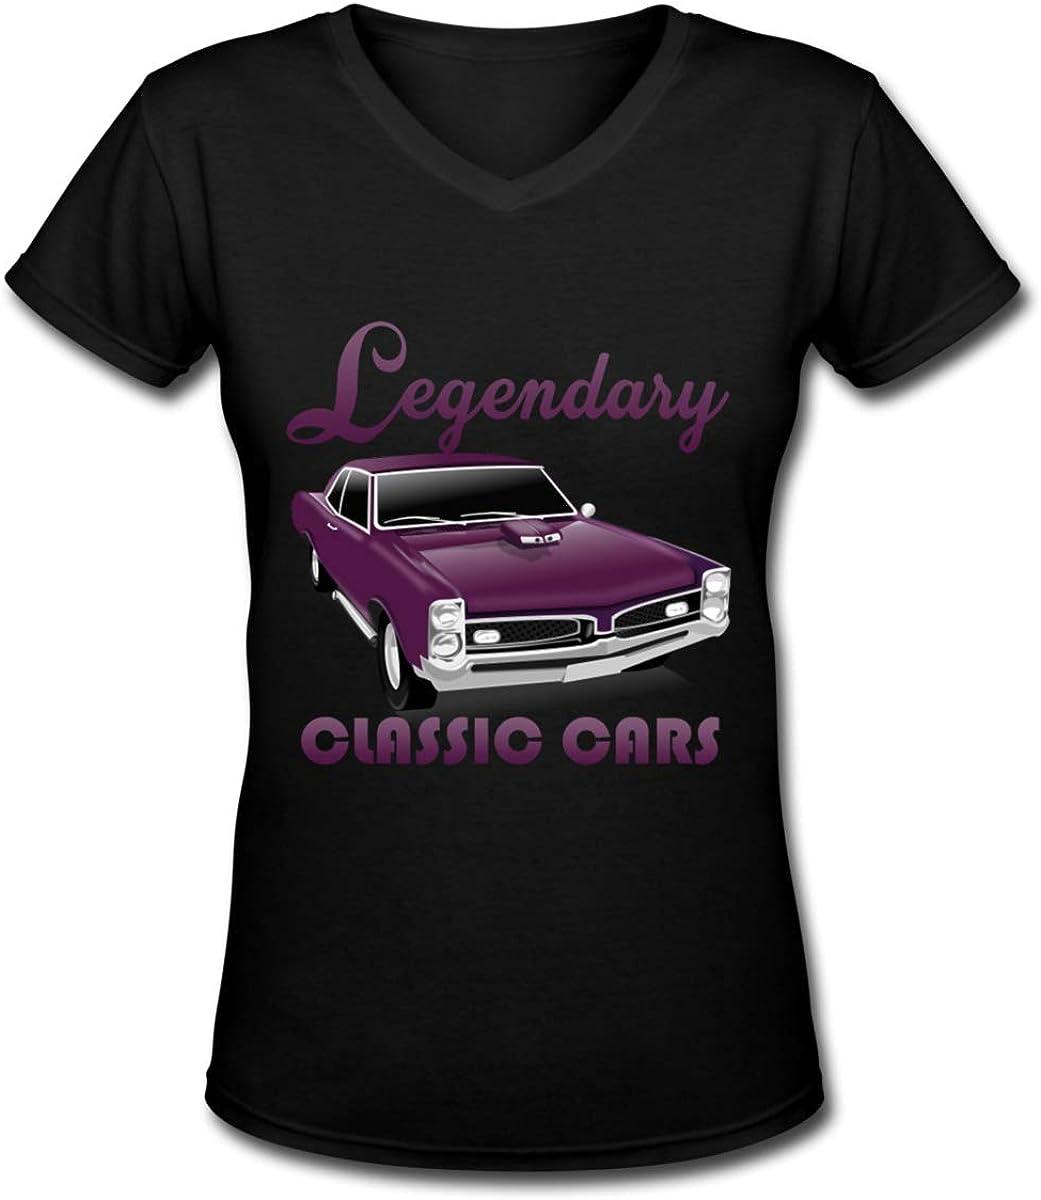 Legendary Classic Cars Womens V-Neck Short Sleeve Tee